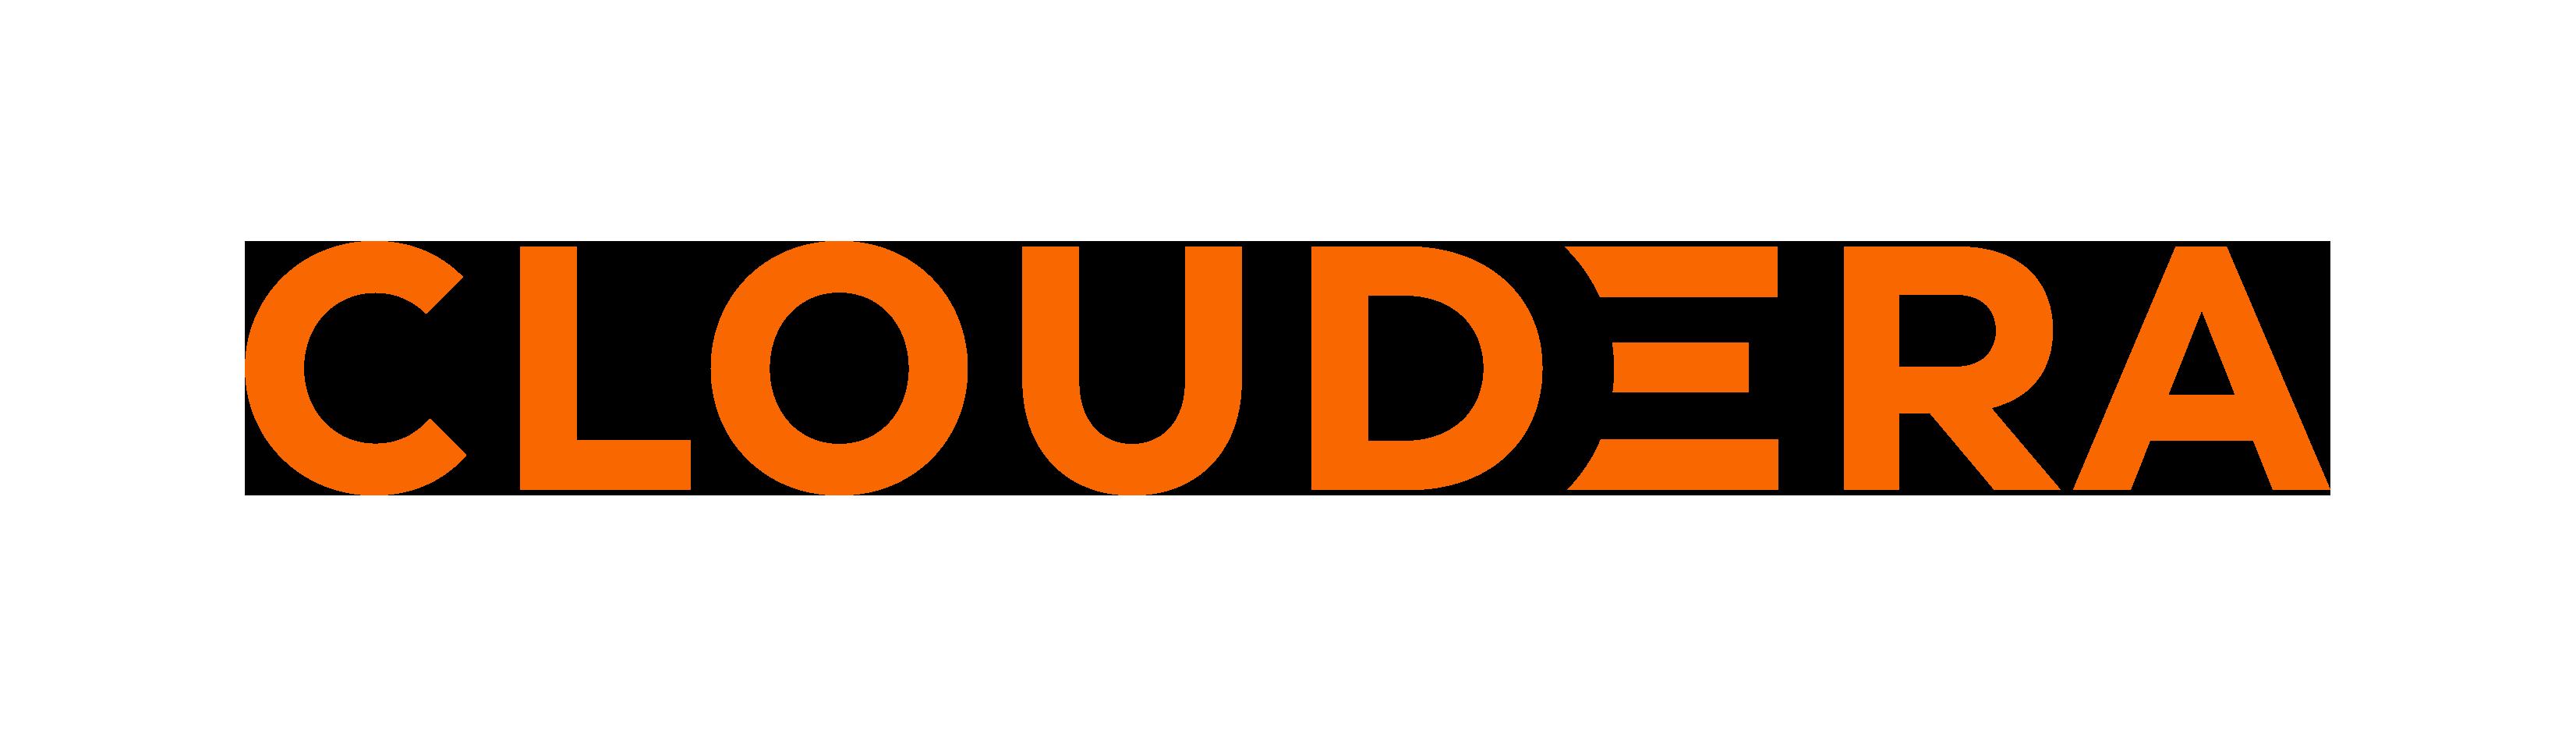 Cloudera Data Platform logo